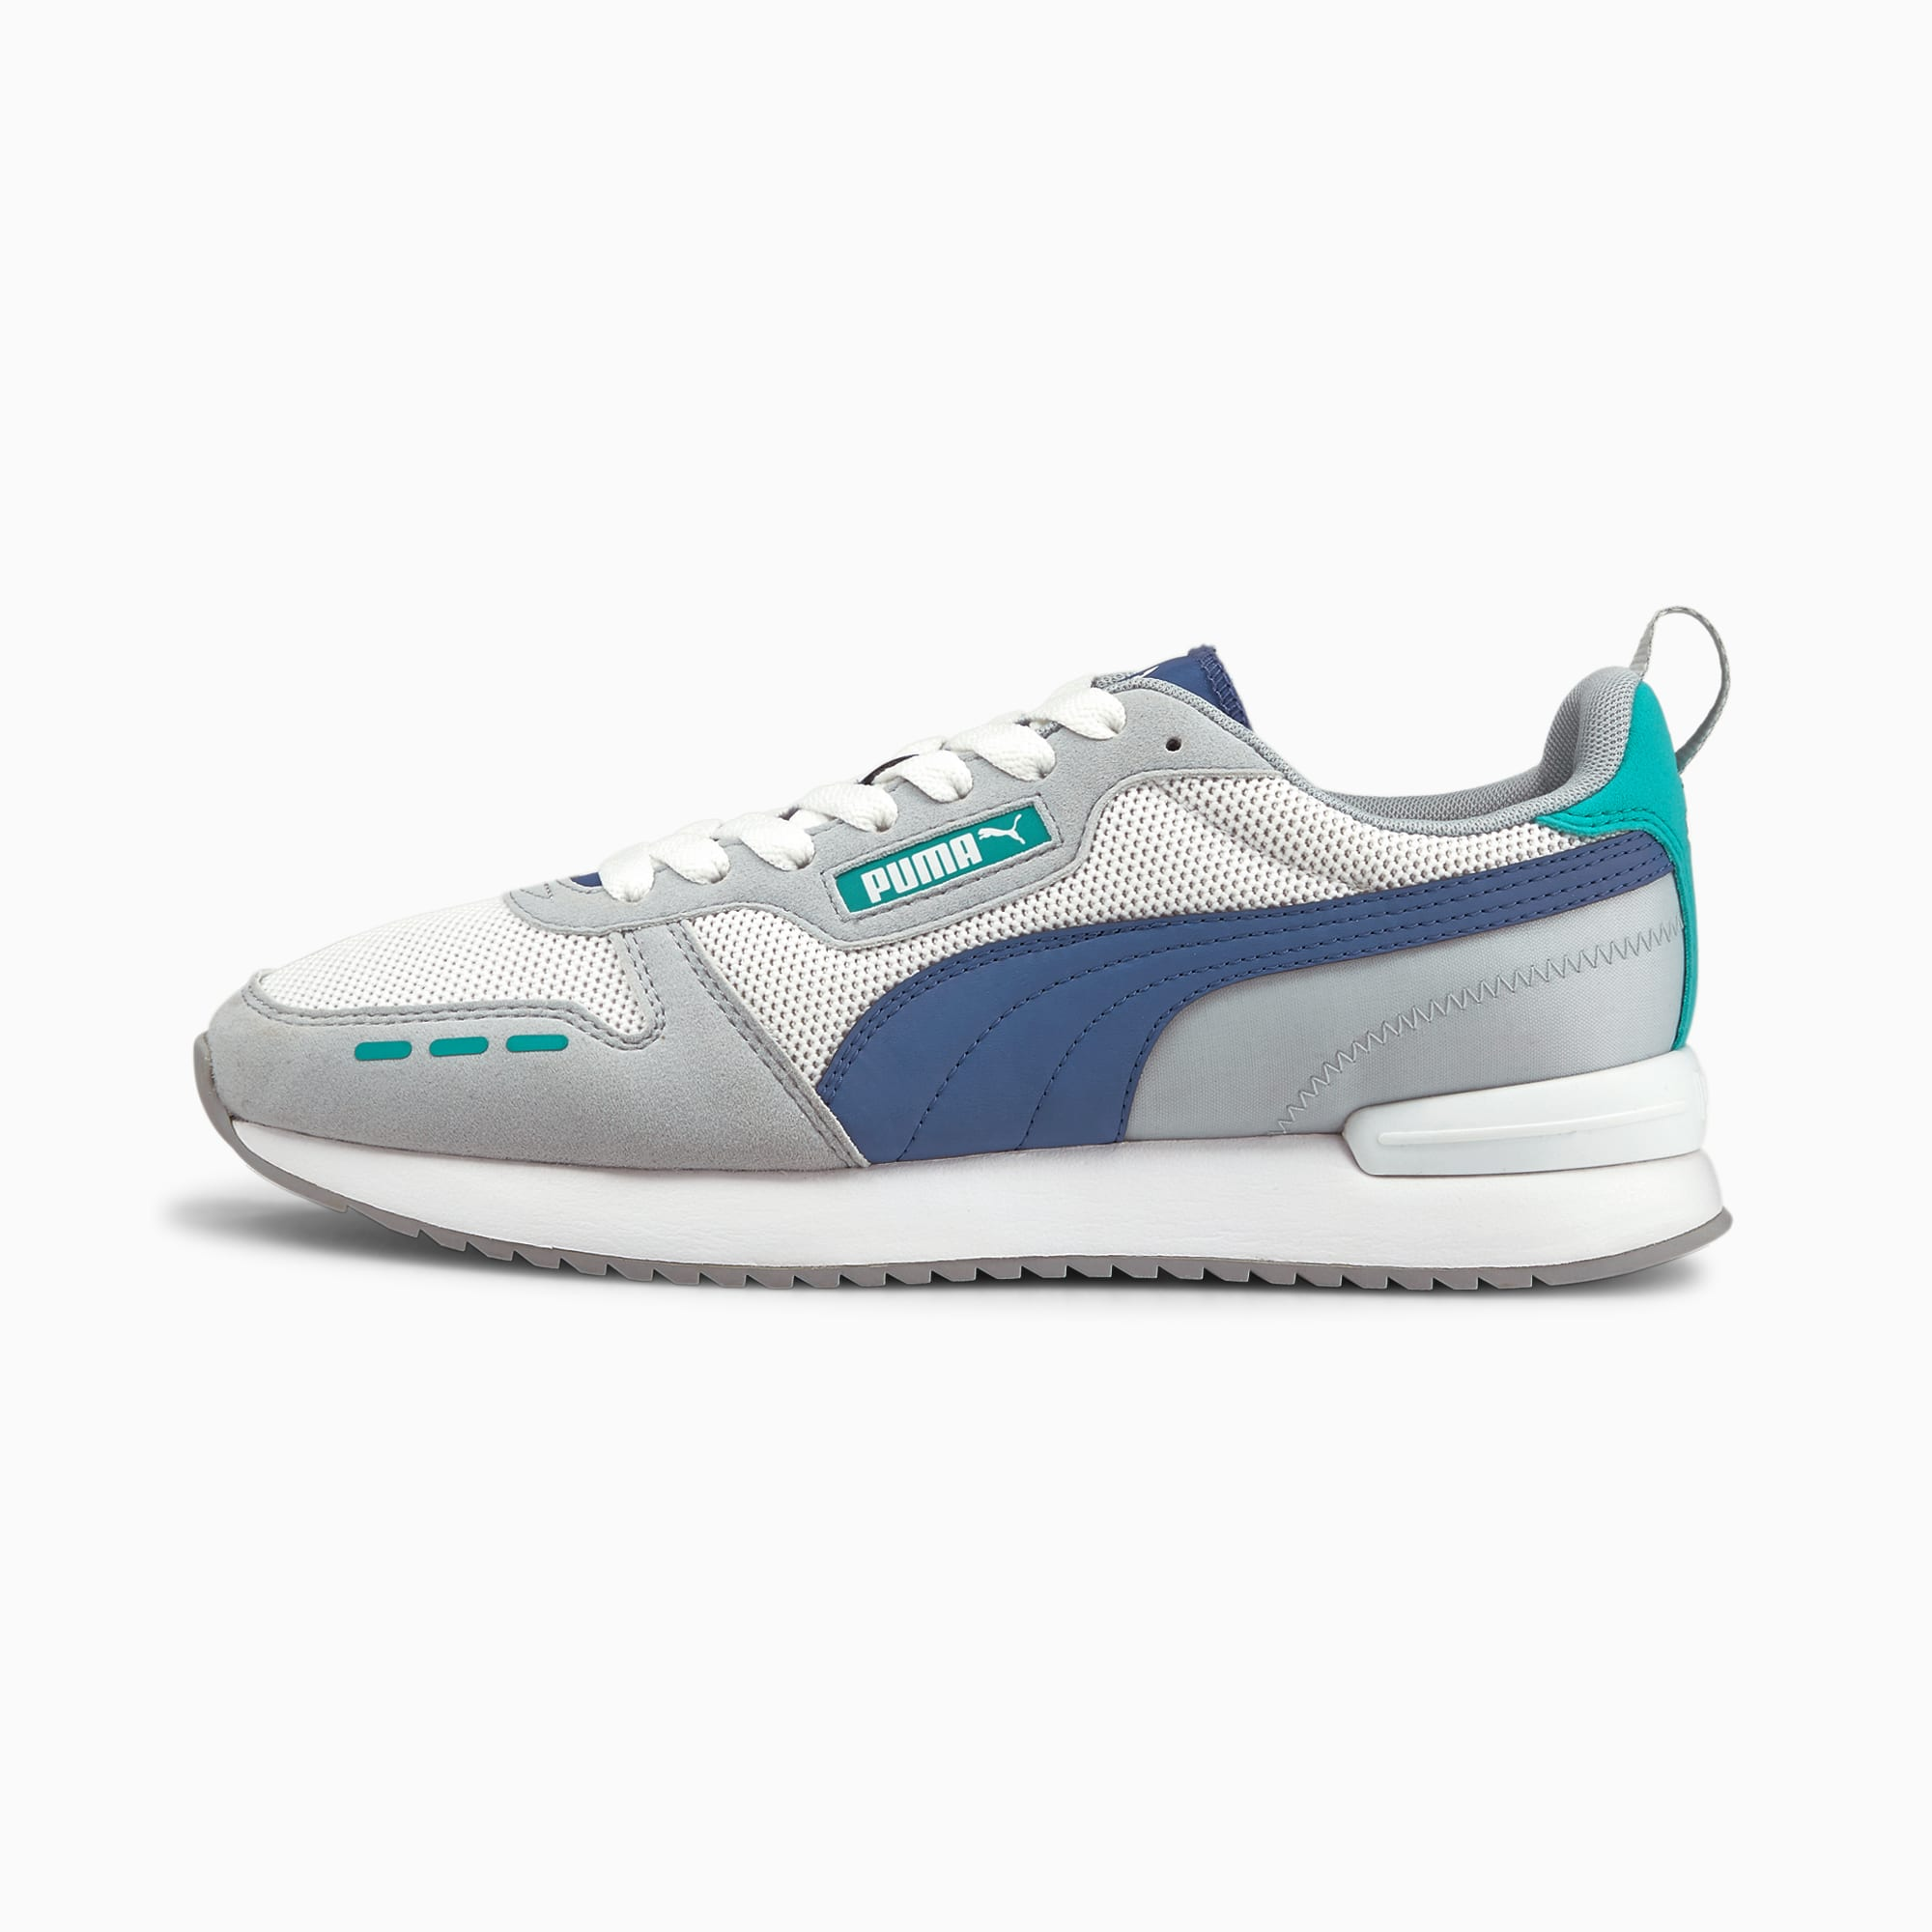 PUMA R78 Sneakers | PUMA US